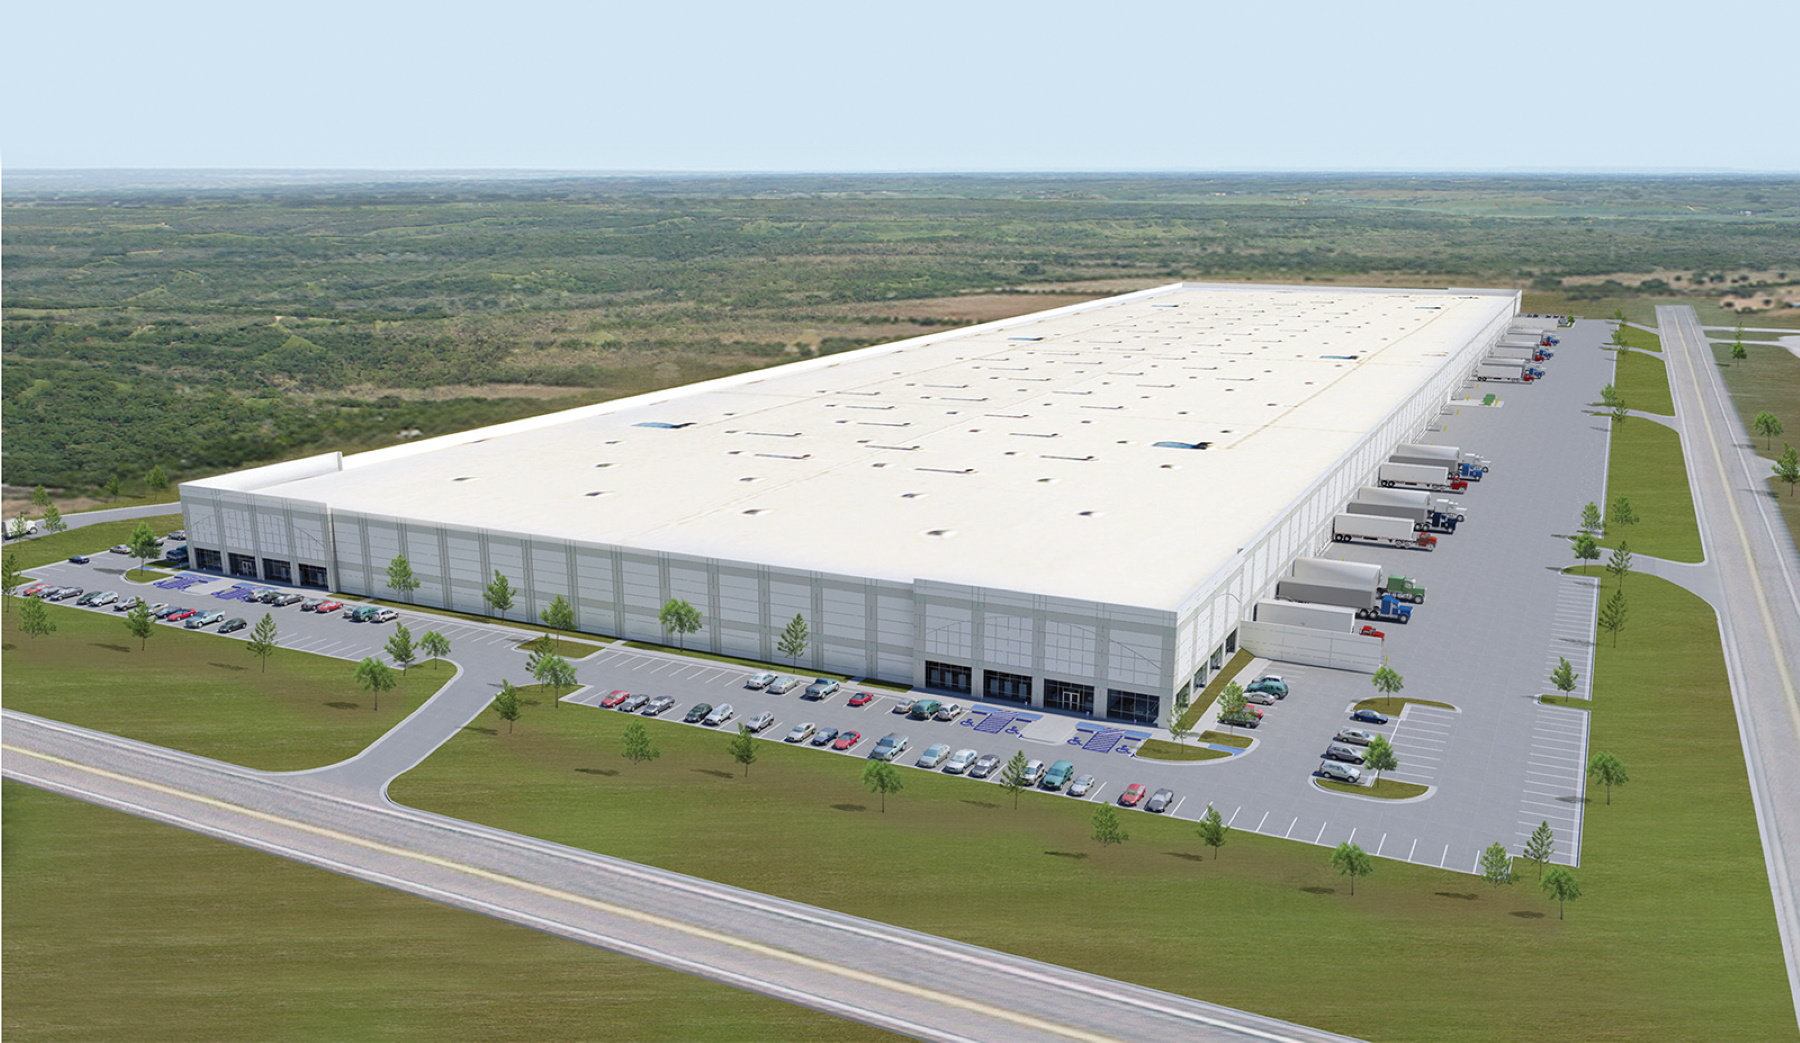 Yokohama Tire opens 430,000sqft distribution centre in Texas